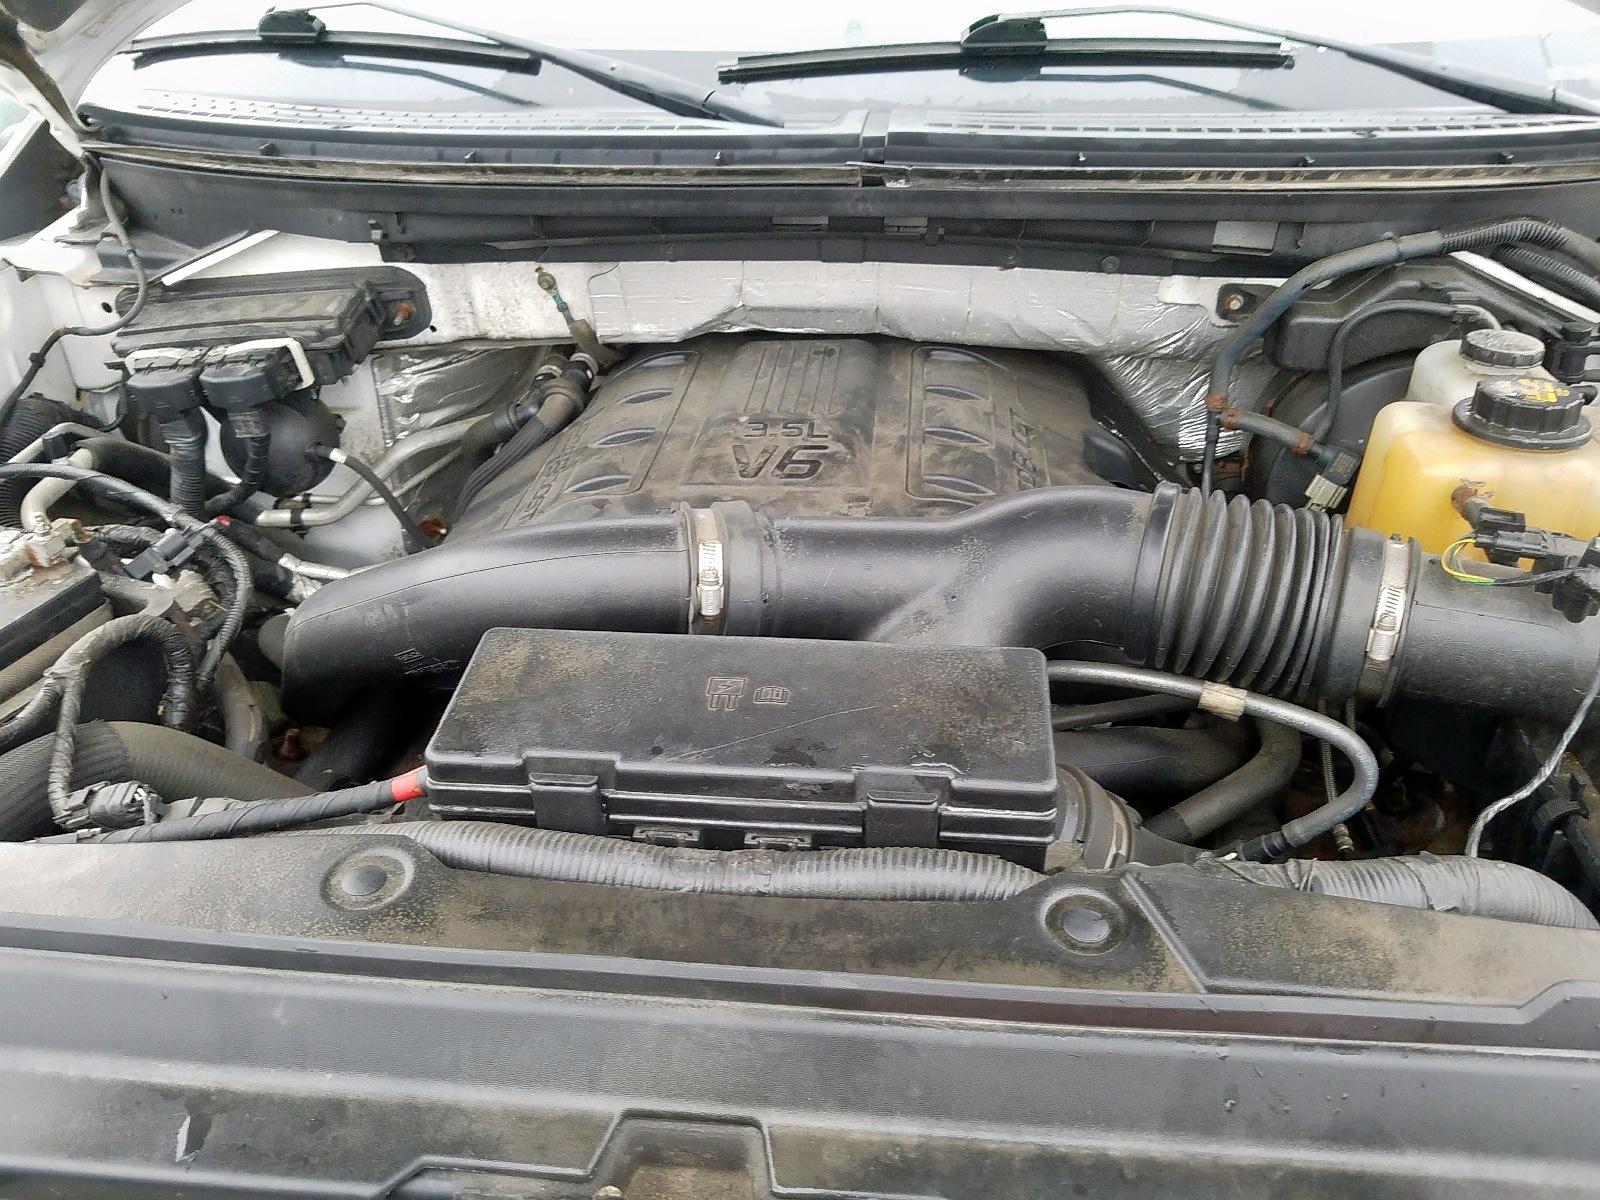 2012 Ford F150 Super 3.5L inside view